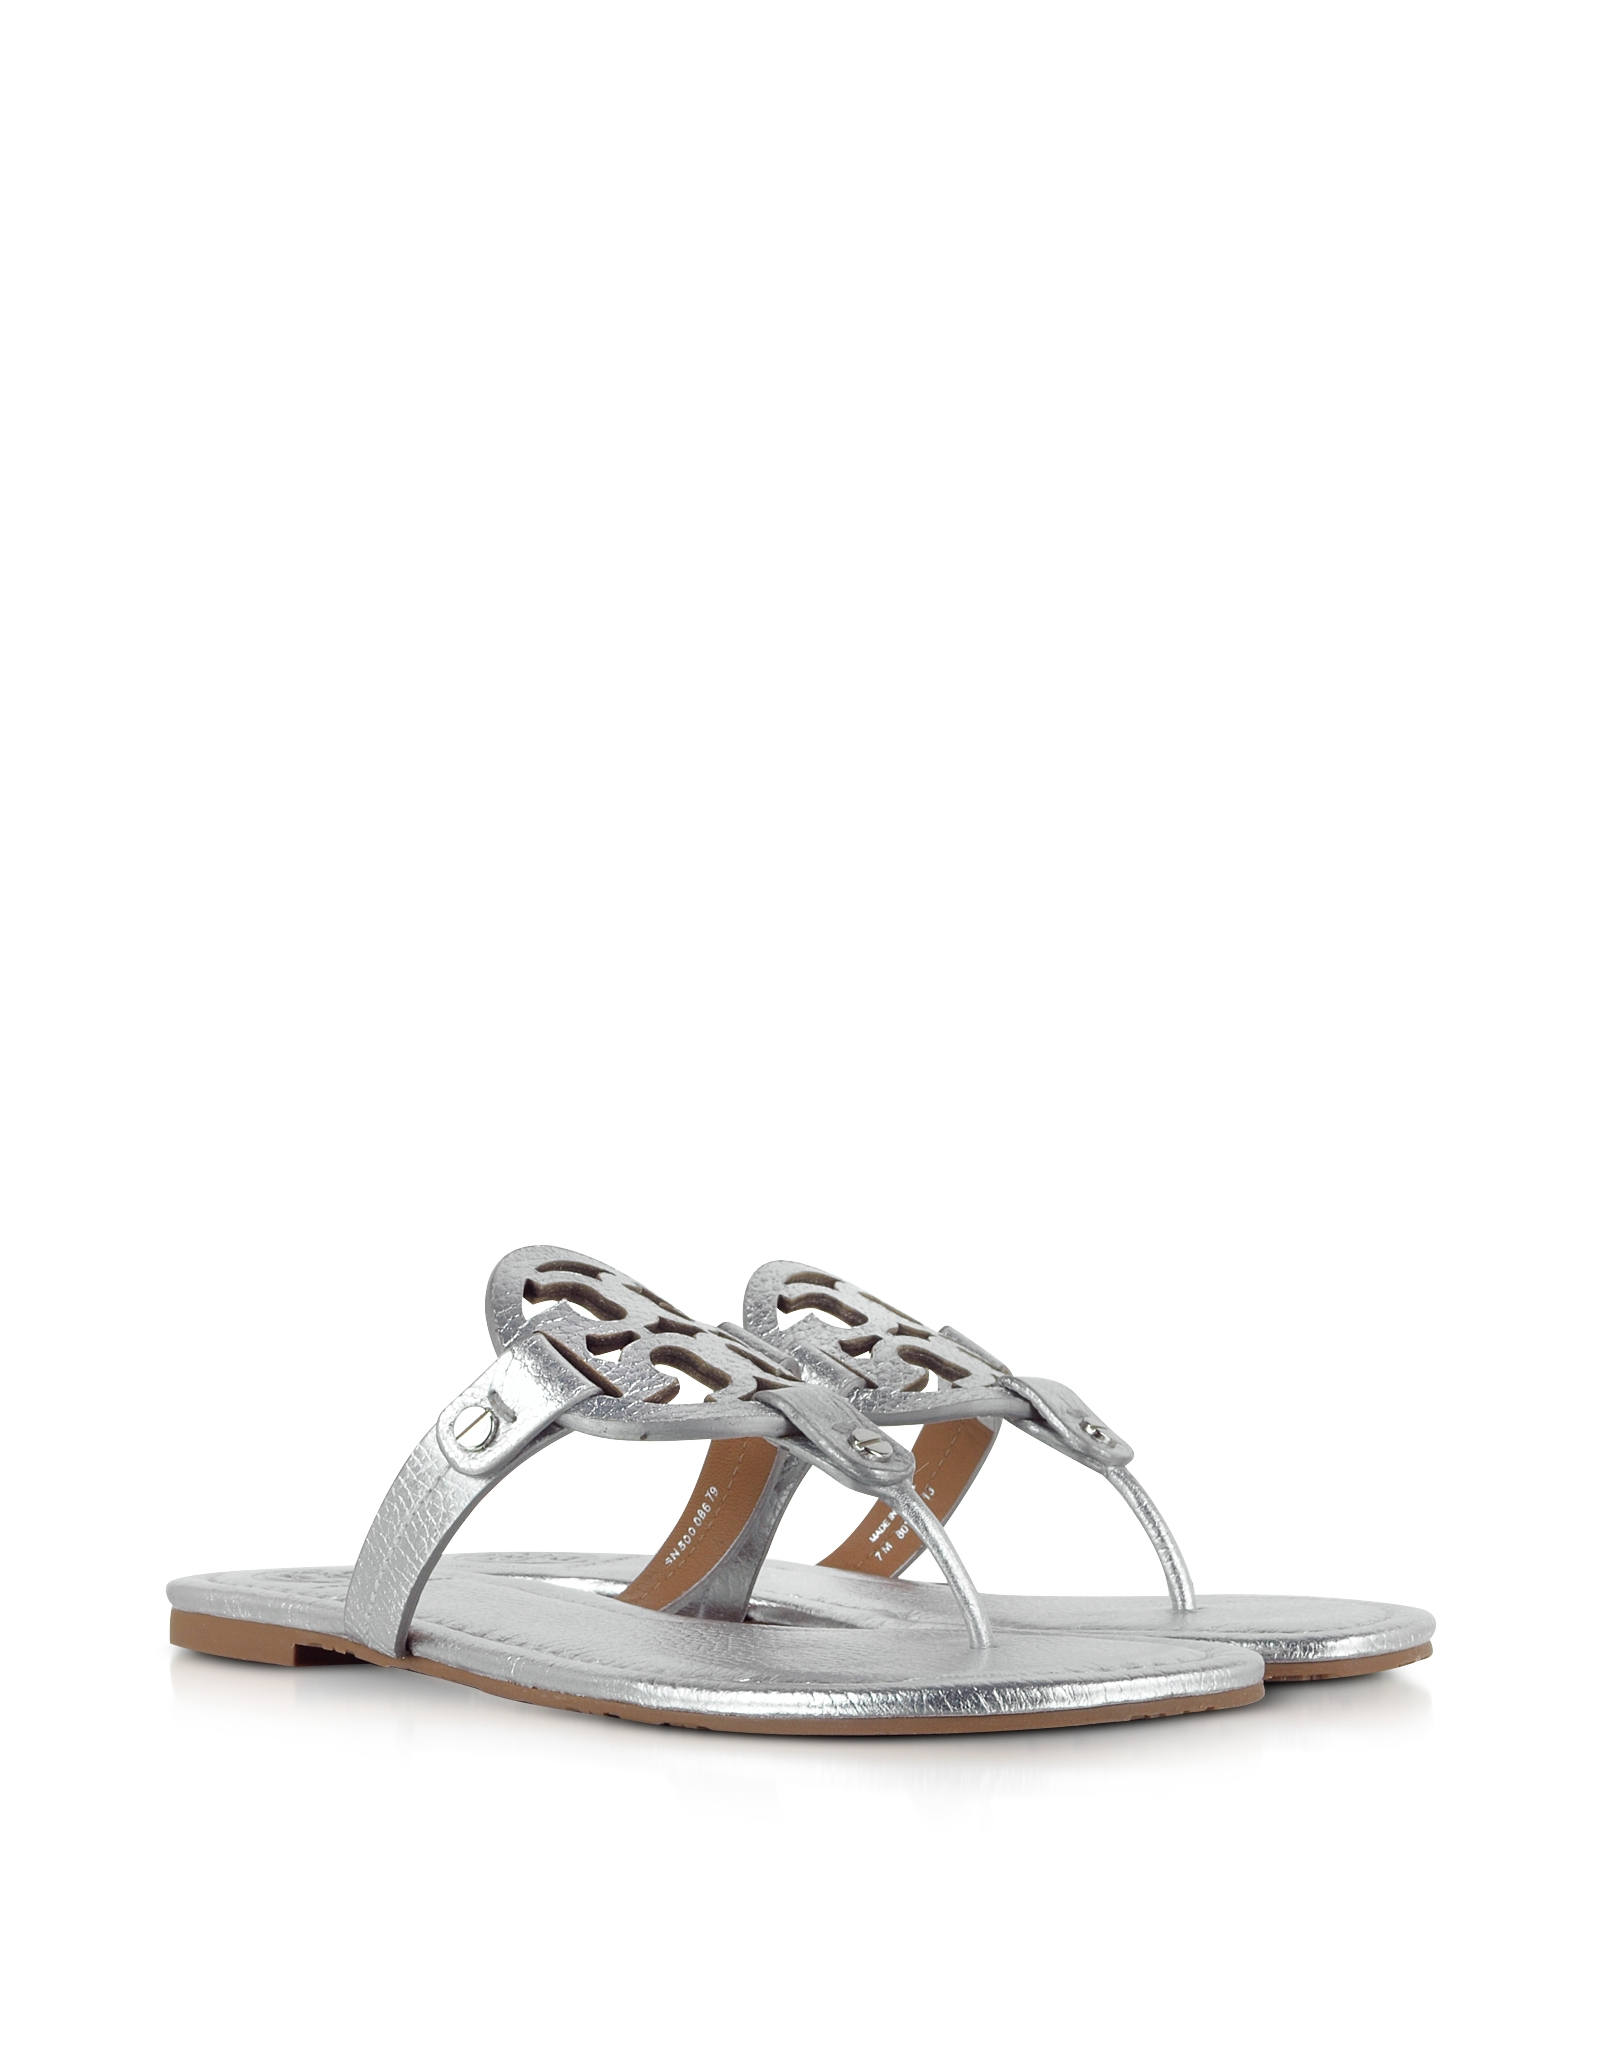 59860d0c085d Lyst - Tory Burch Miller Metallic Silver Leather Sandal in Metallic